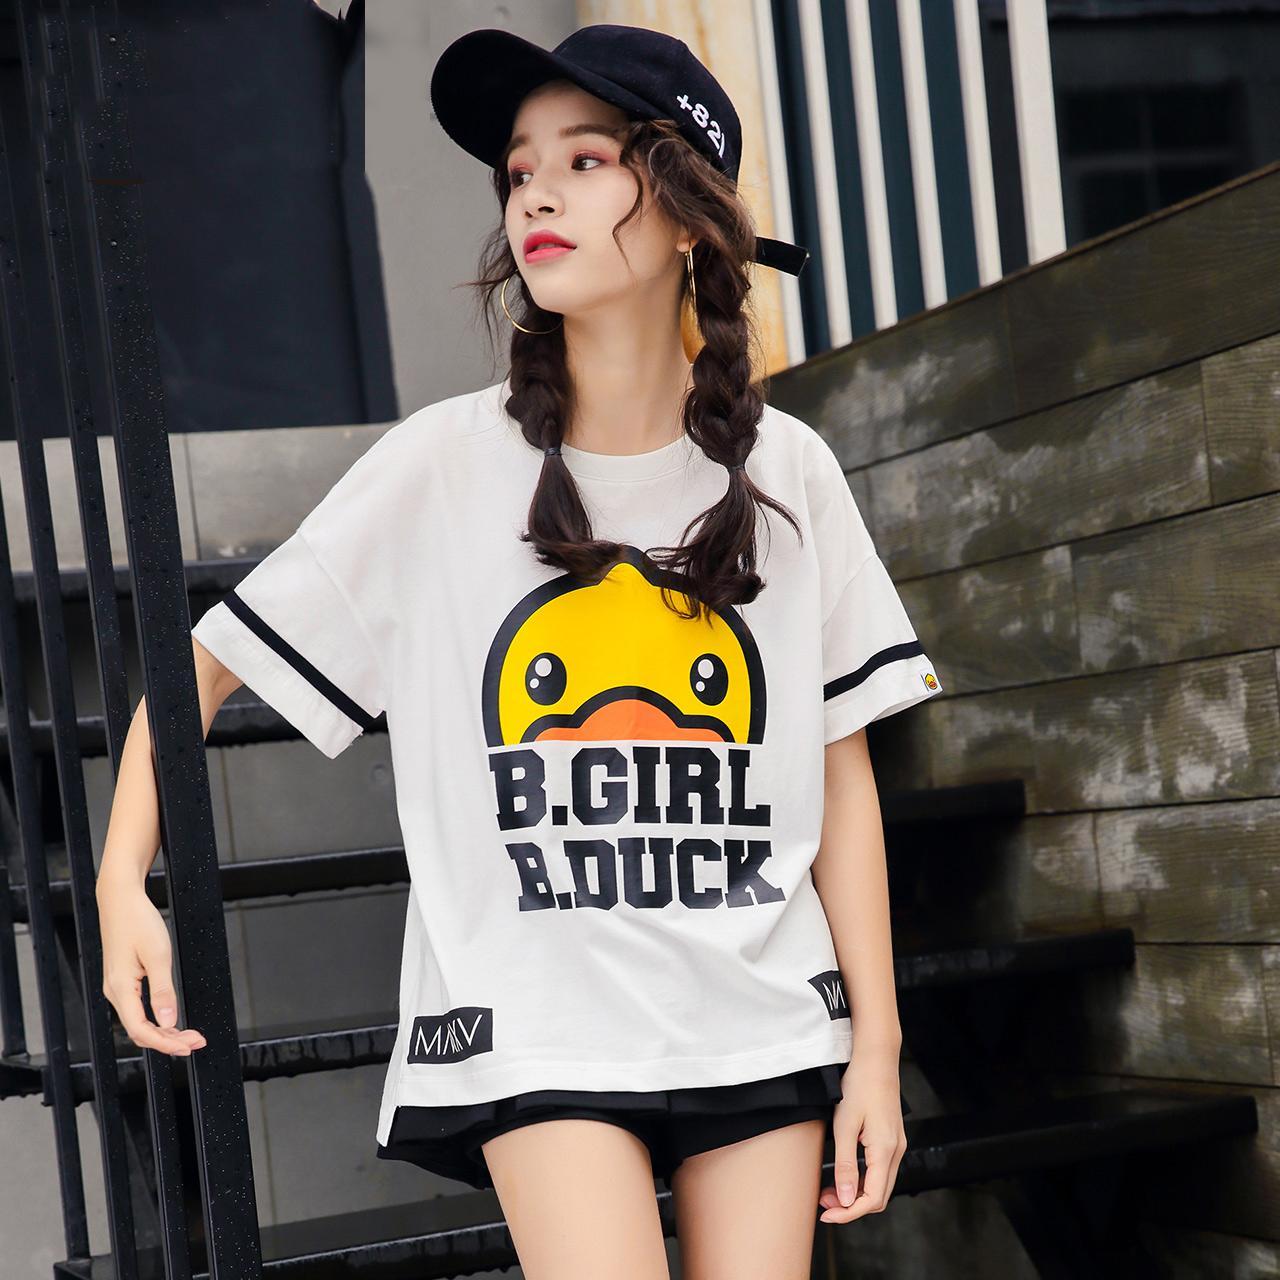 duck小黄鸭2017夏新款时尚印花白色短袖t恤女宽松上衣打底衫潮